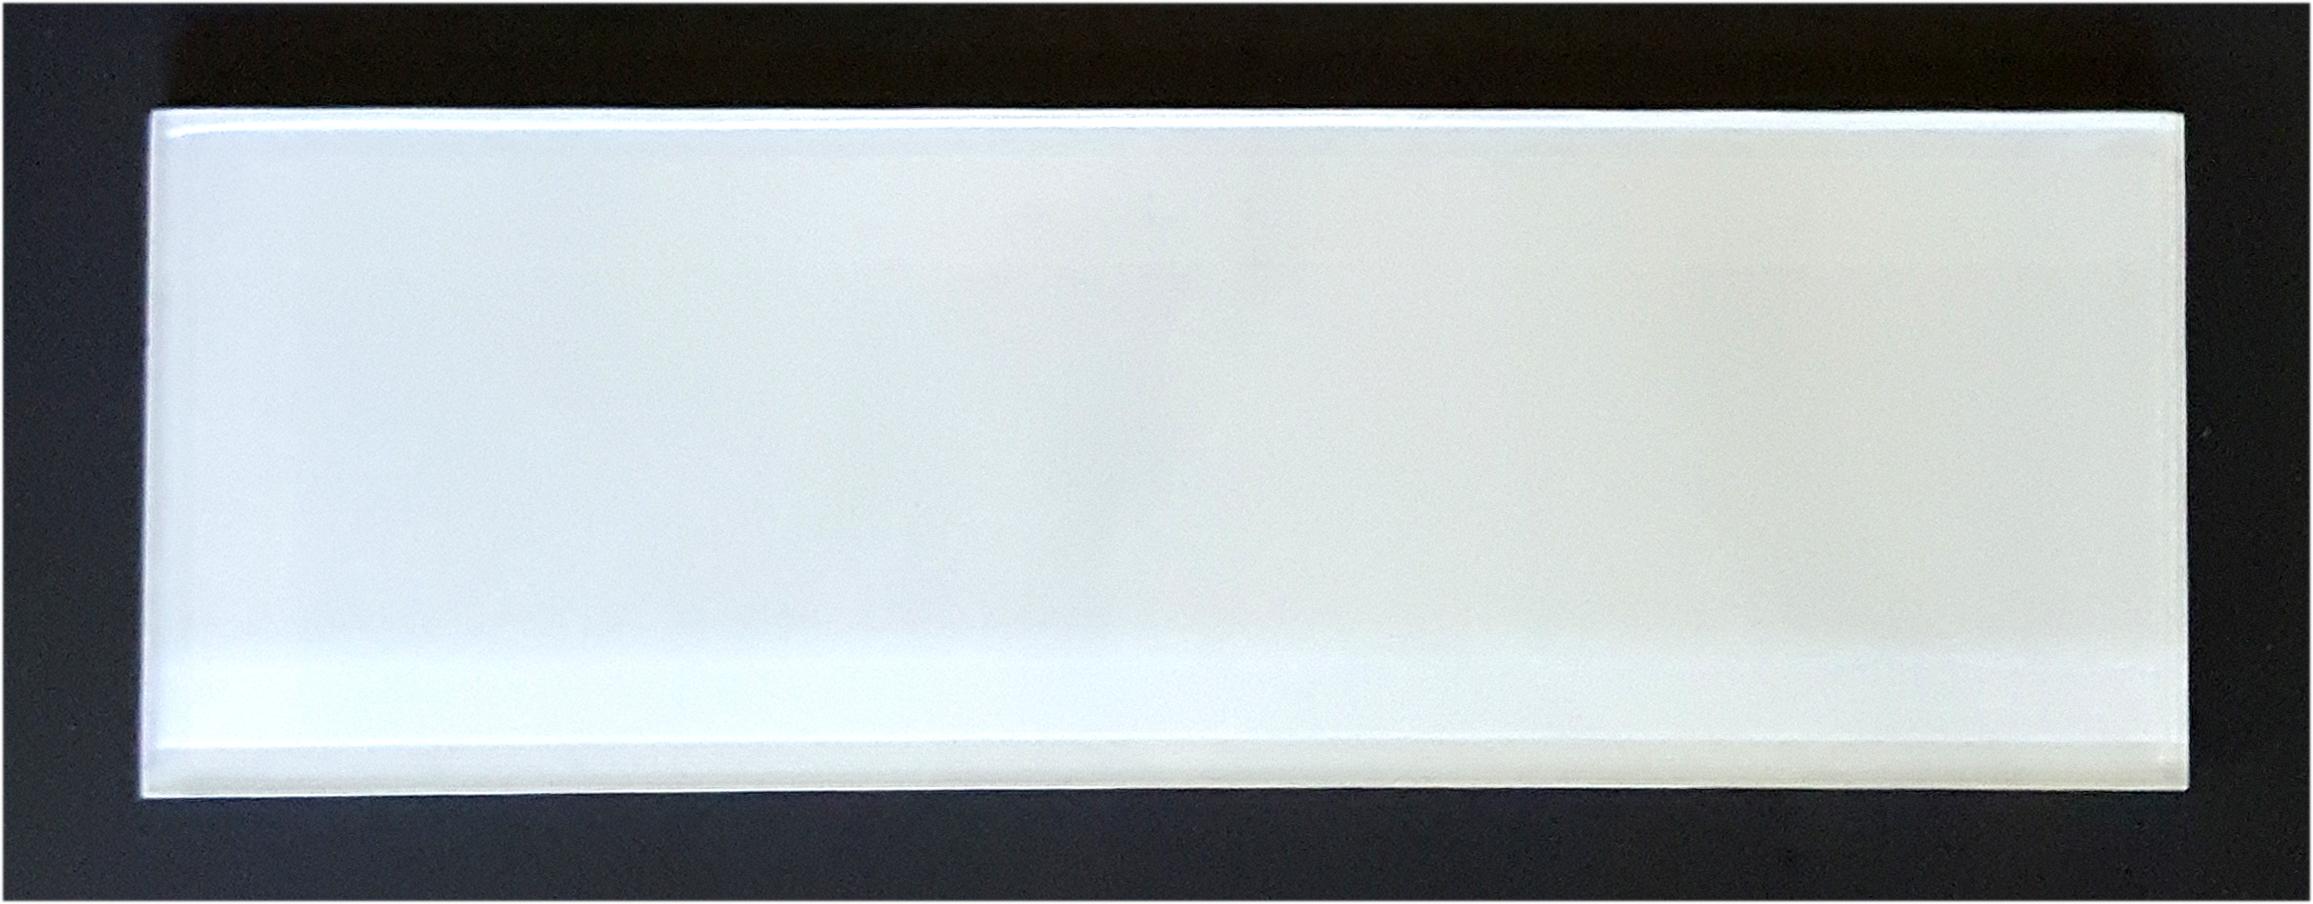 "TREND WHITE4X12 - White 4""X12"" Glass   33 PC/CTN (  10.76 SF);   72 CTN/PLT"